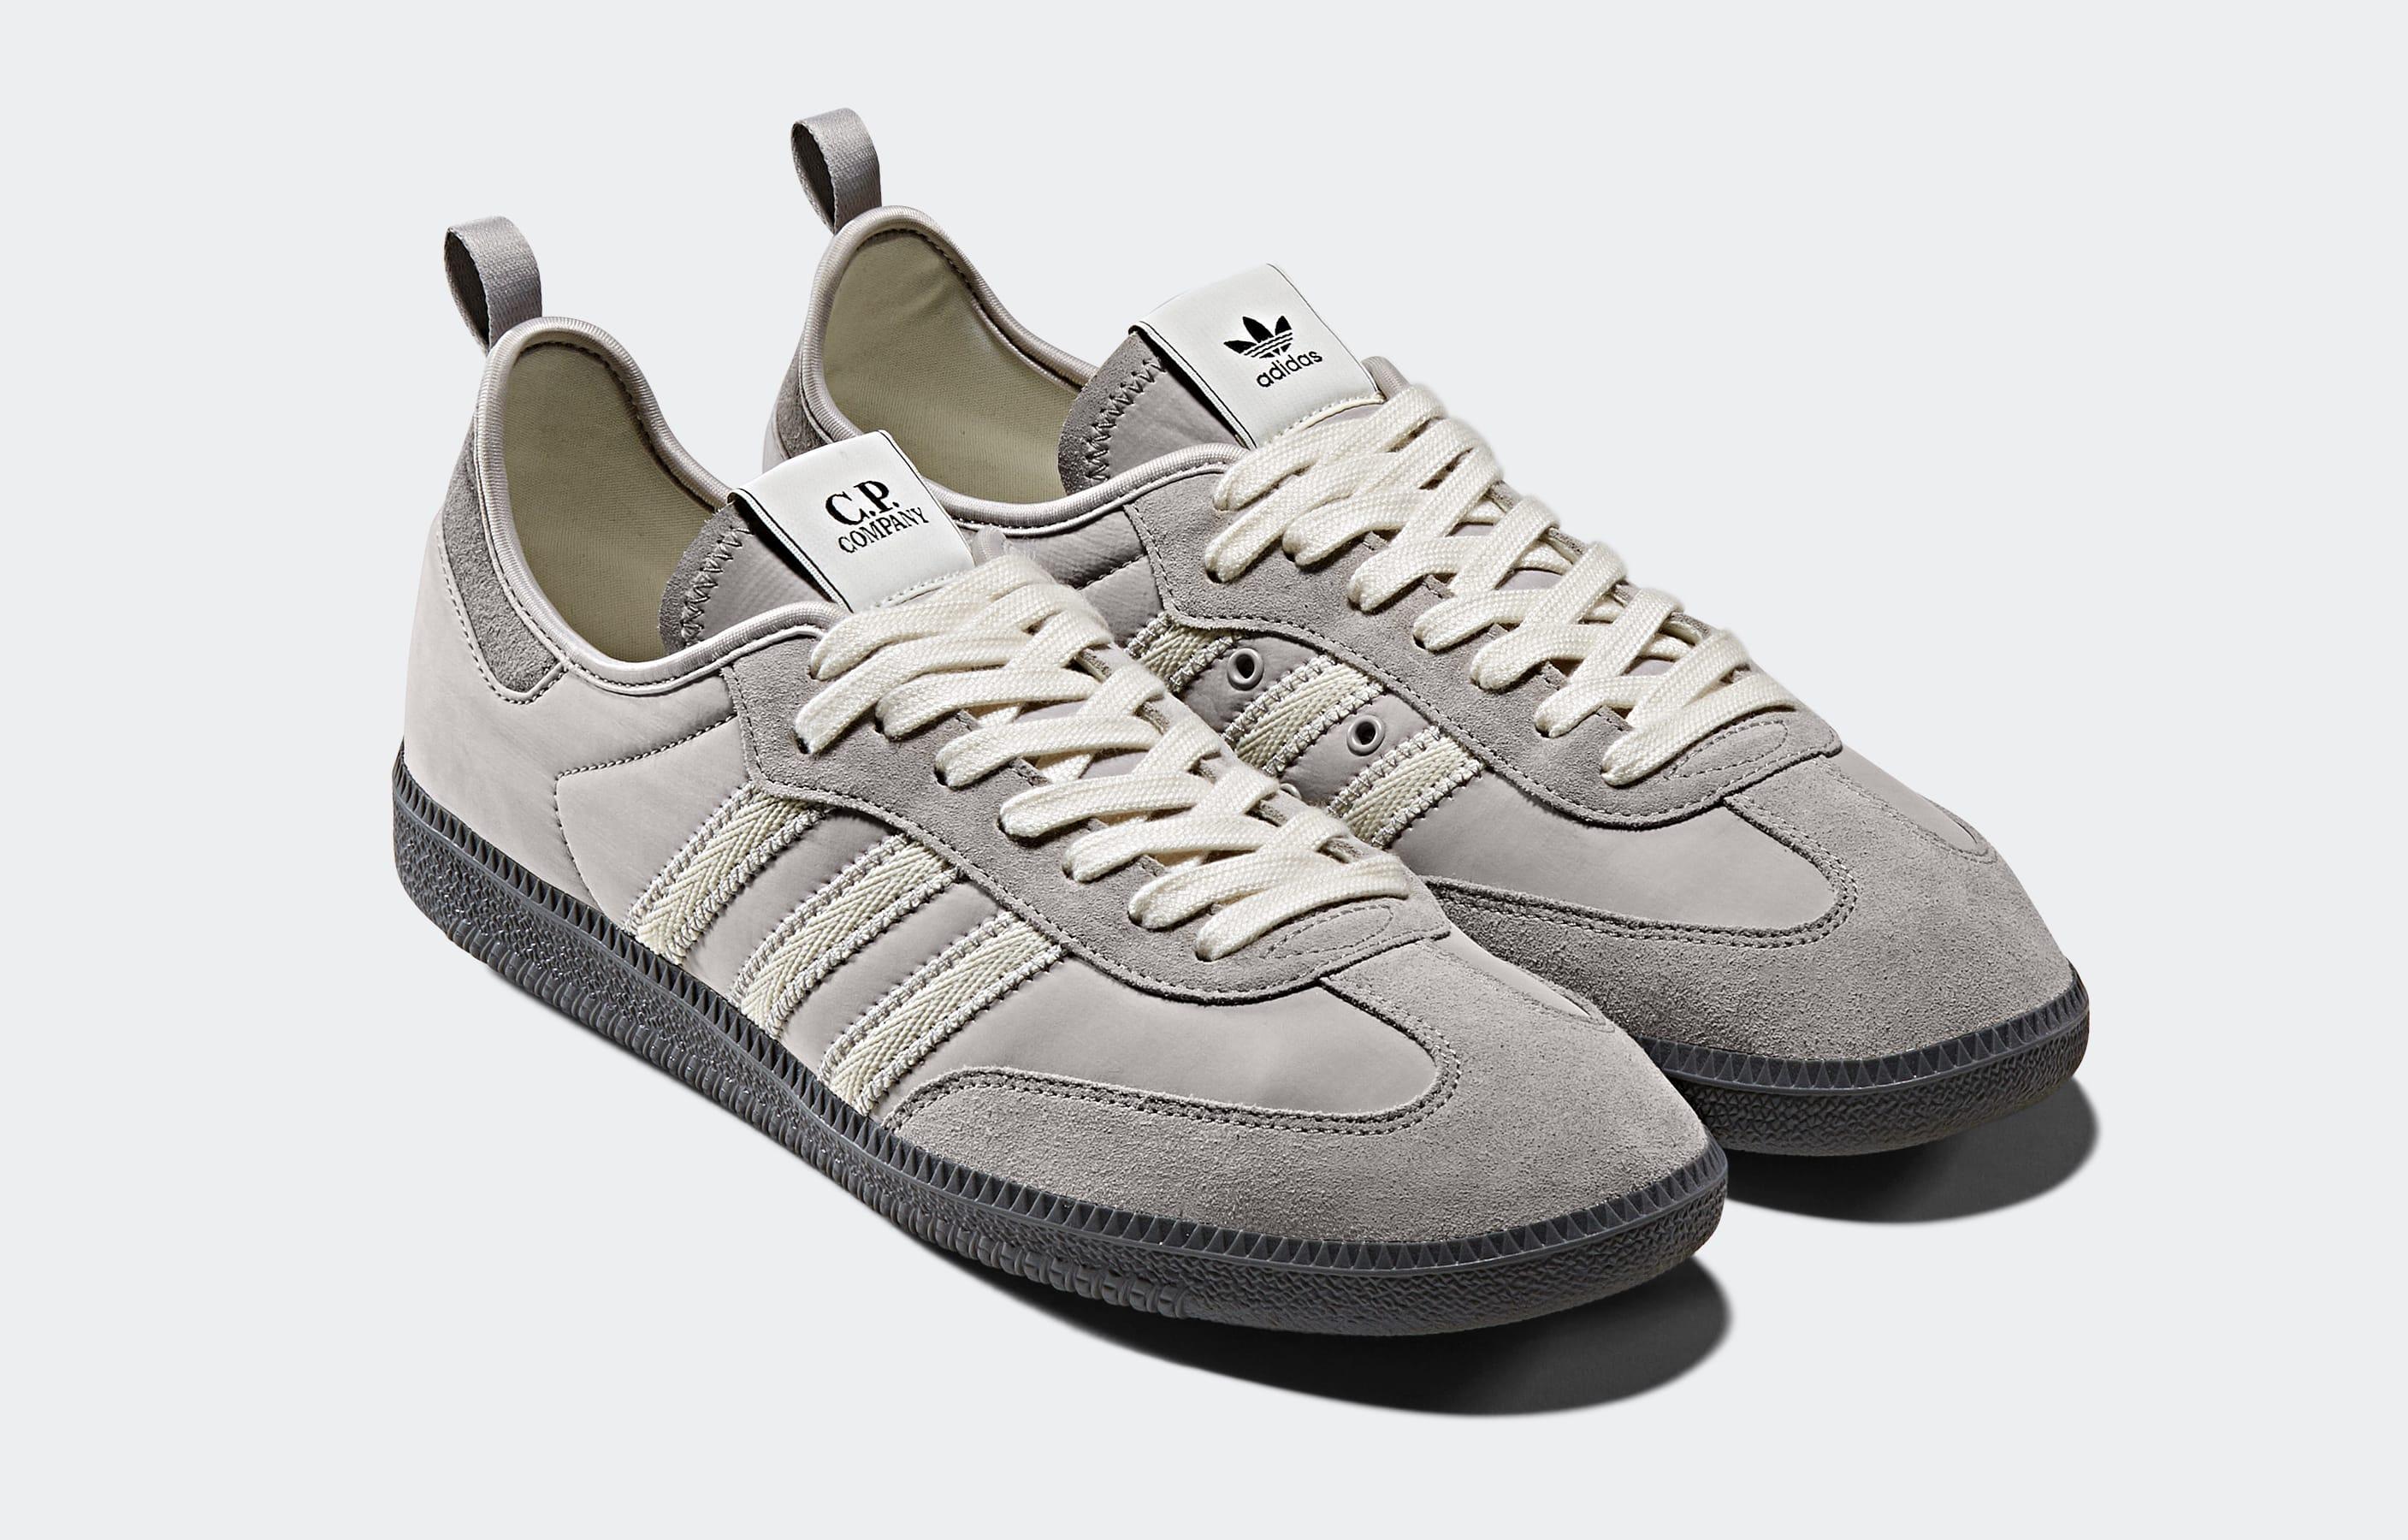 Adidas x C.P. Company Samba 'Grey' F33870